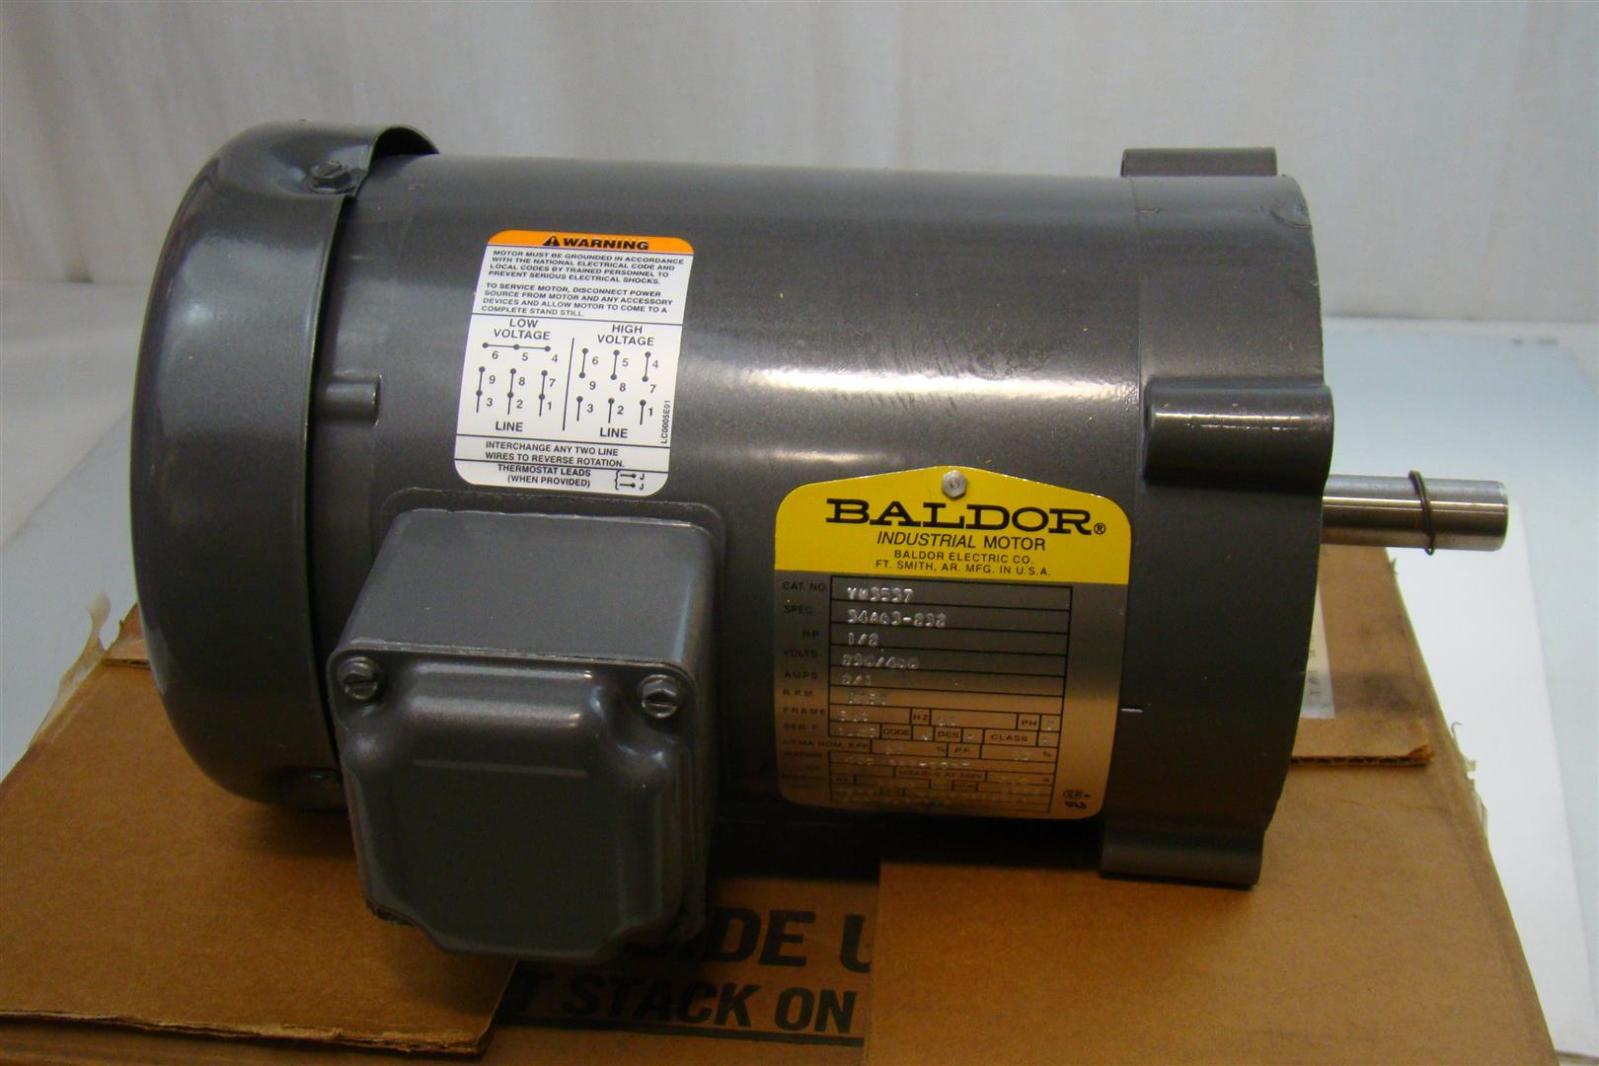 aew119 baldor electric co industrial electric motor 230 460v 2 1amp 345rpm 1 2hp vm3537 2?resize\\\\\\\\\\\\\\\\\\\\\\\\\\\\\\\=665%2C443 2 hp baldor motor wiring diagram schematic 2 wiring diagrams  at soozxer.org